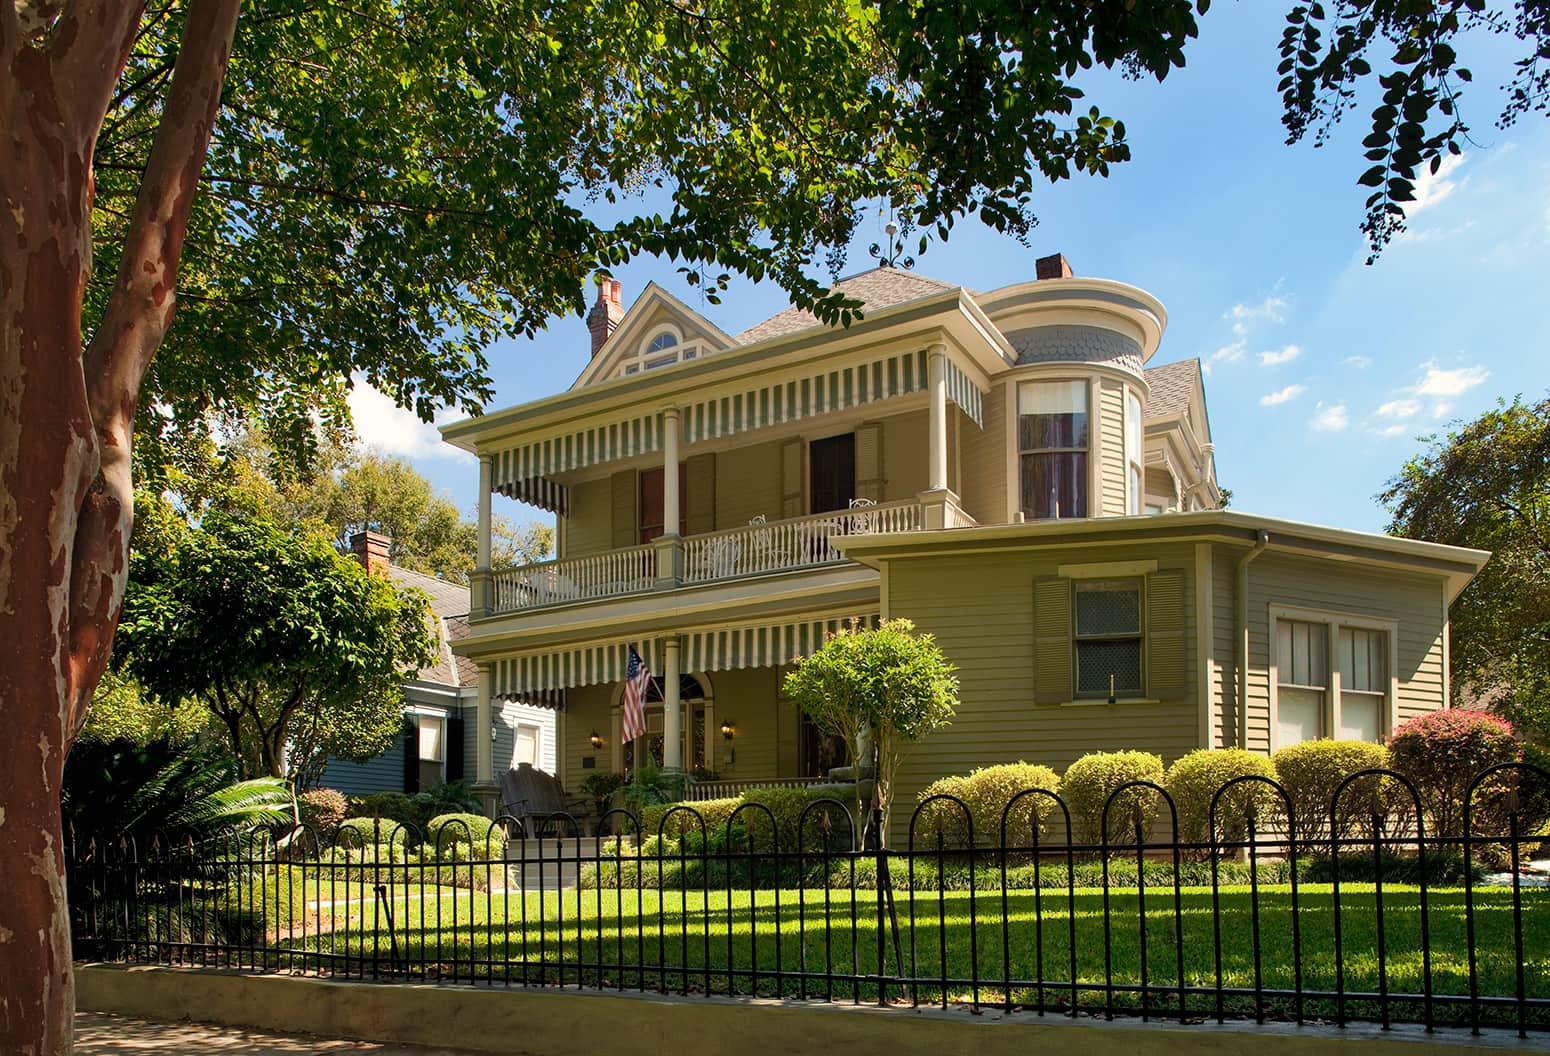 1893 Victorian Main House